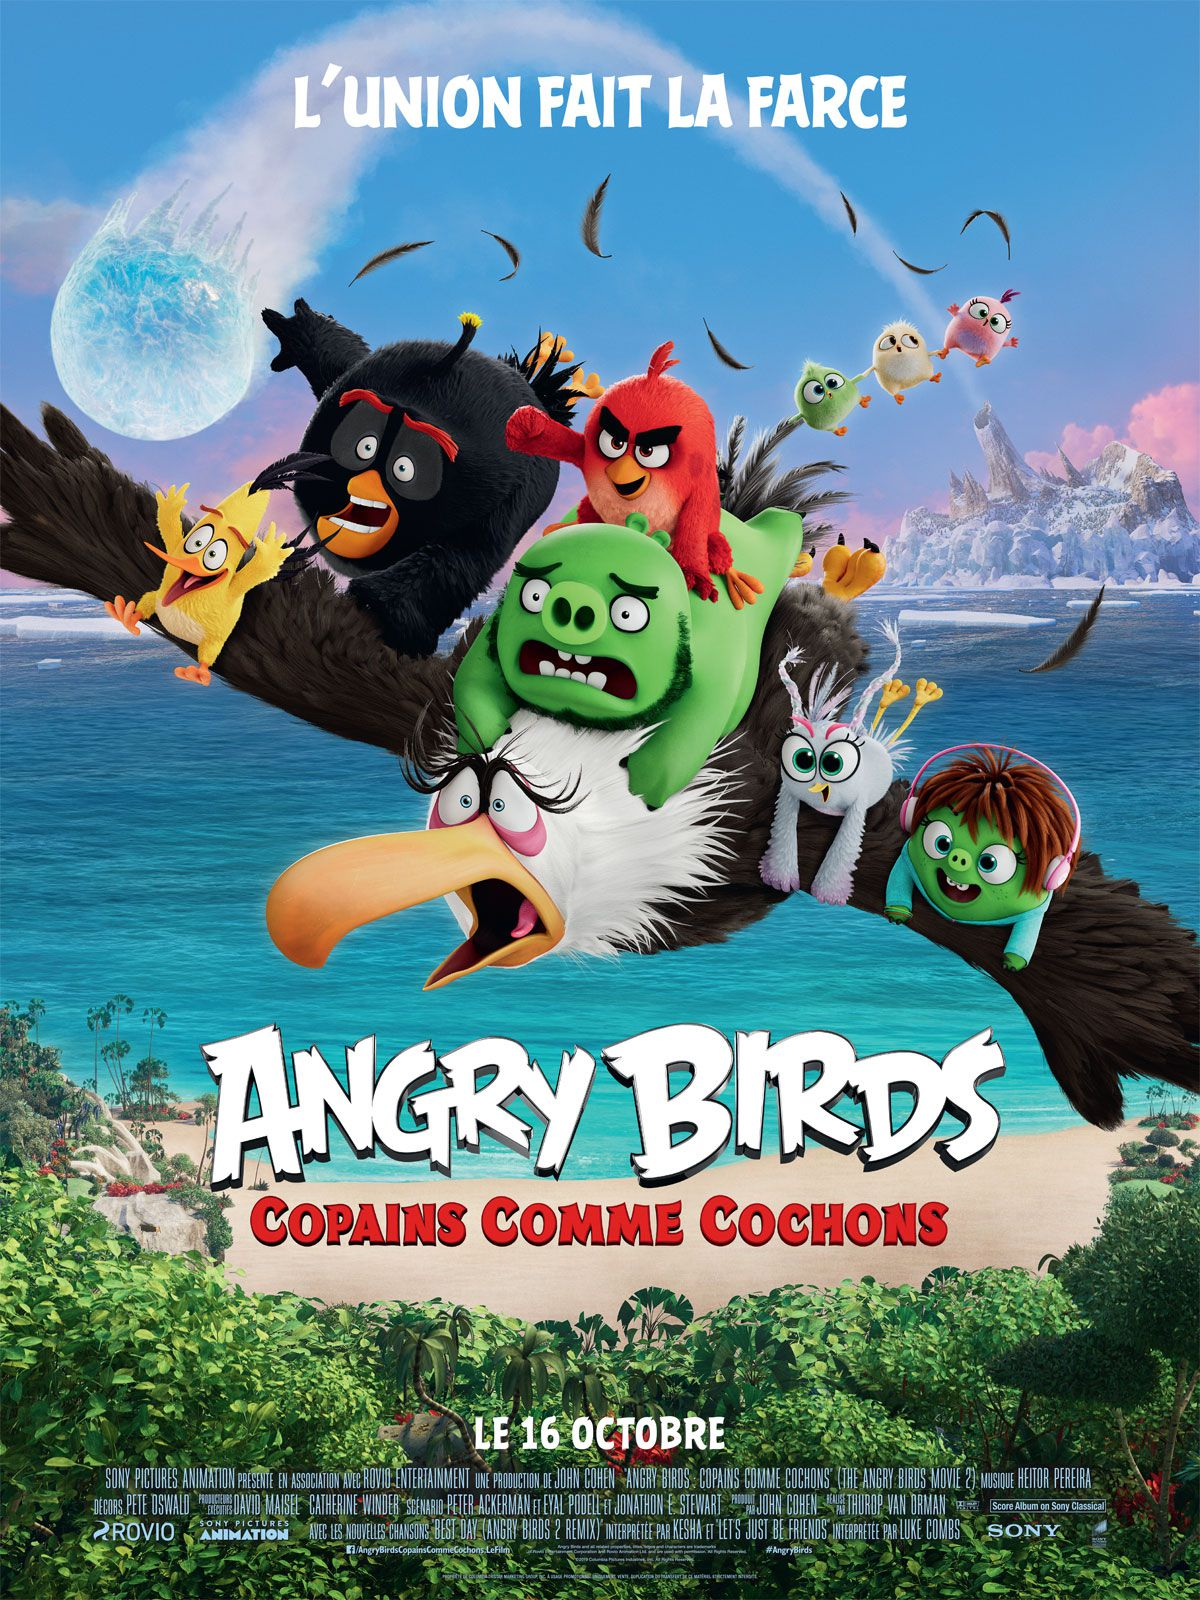 Angry Birds : Copains comme cochons - Long-métrage d'animation (2019)